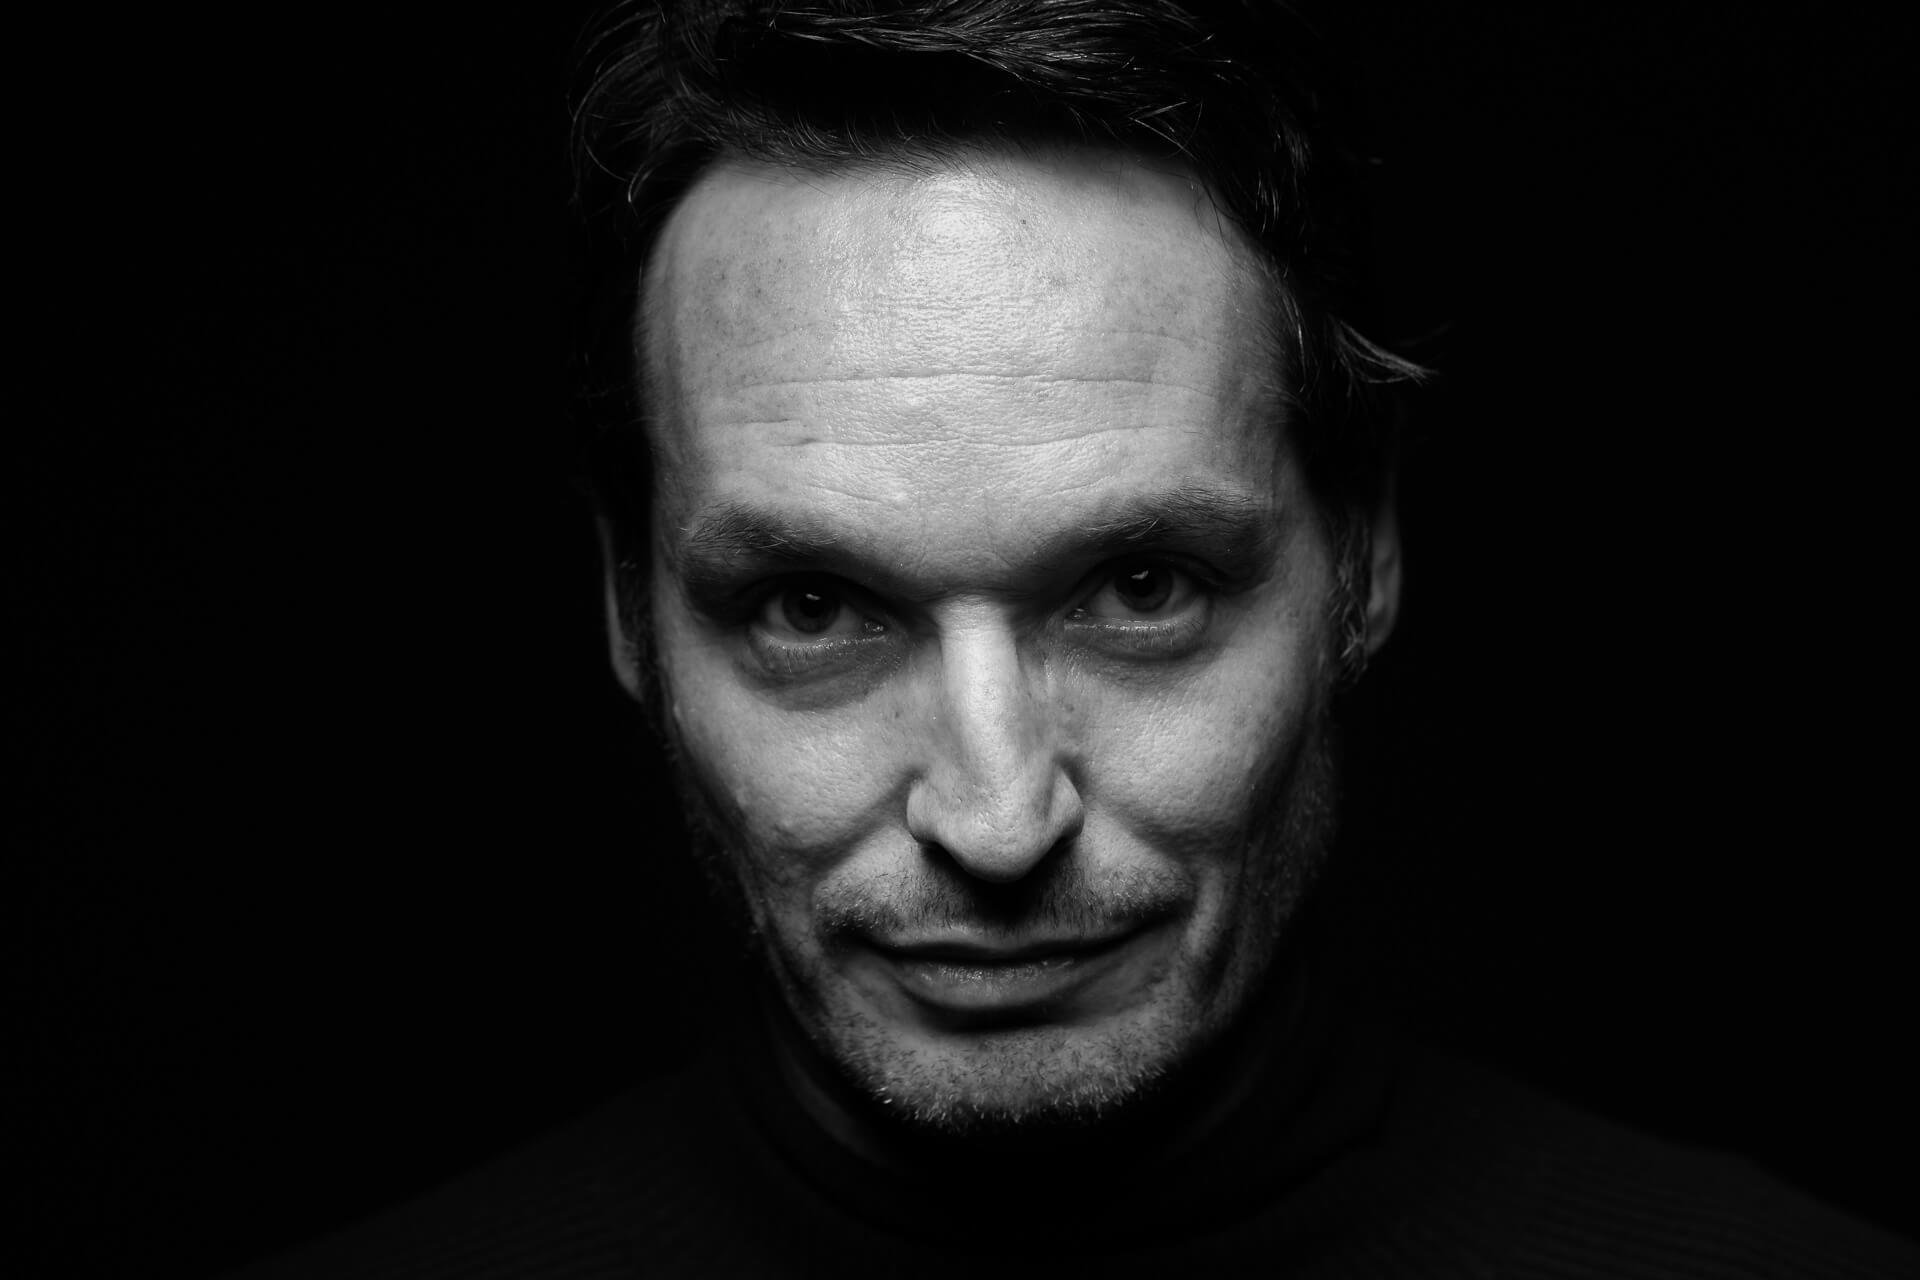 Portrait Fotografie Christian Weber Muenchen Foto cw69